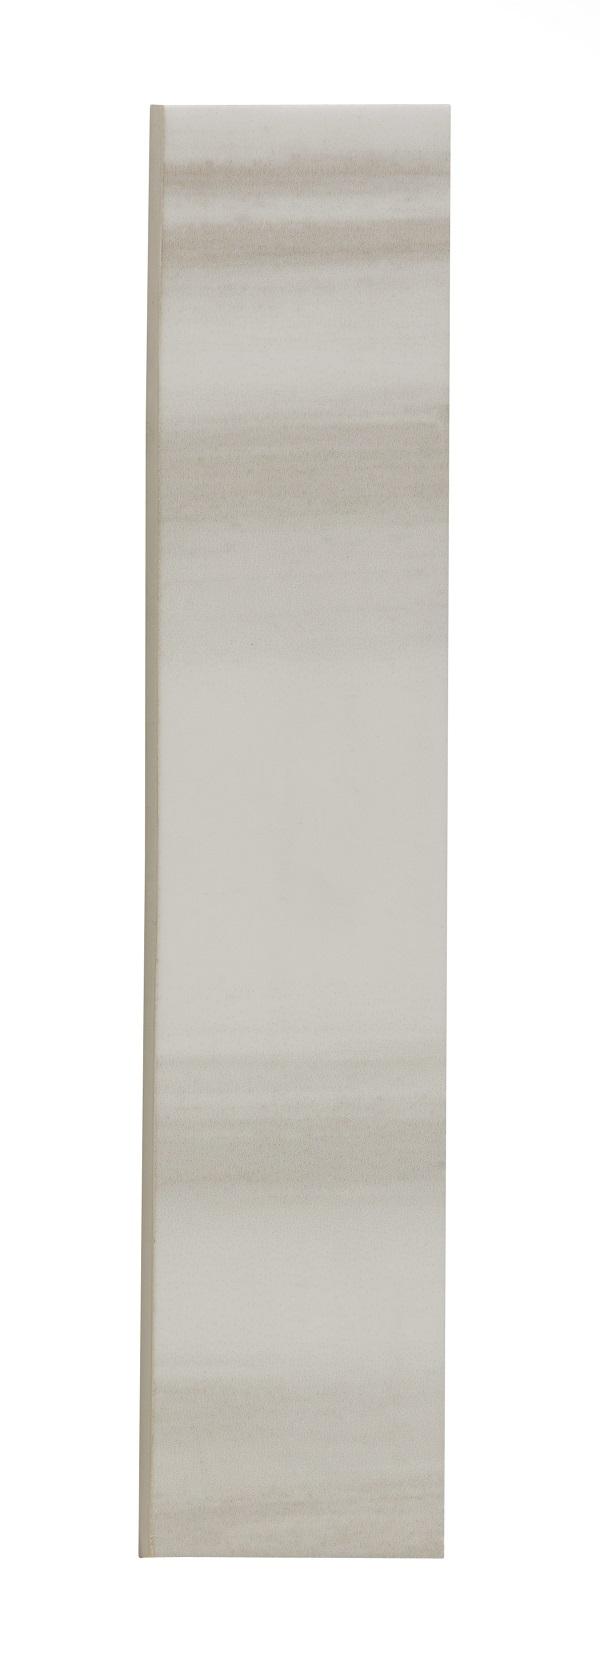 "Horizon Taupe Ceramic Bullnose - 2"" x 10"" Image"